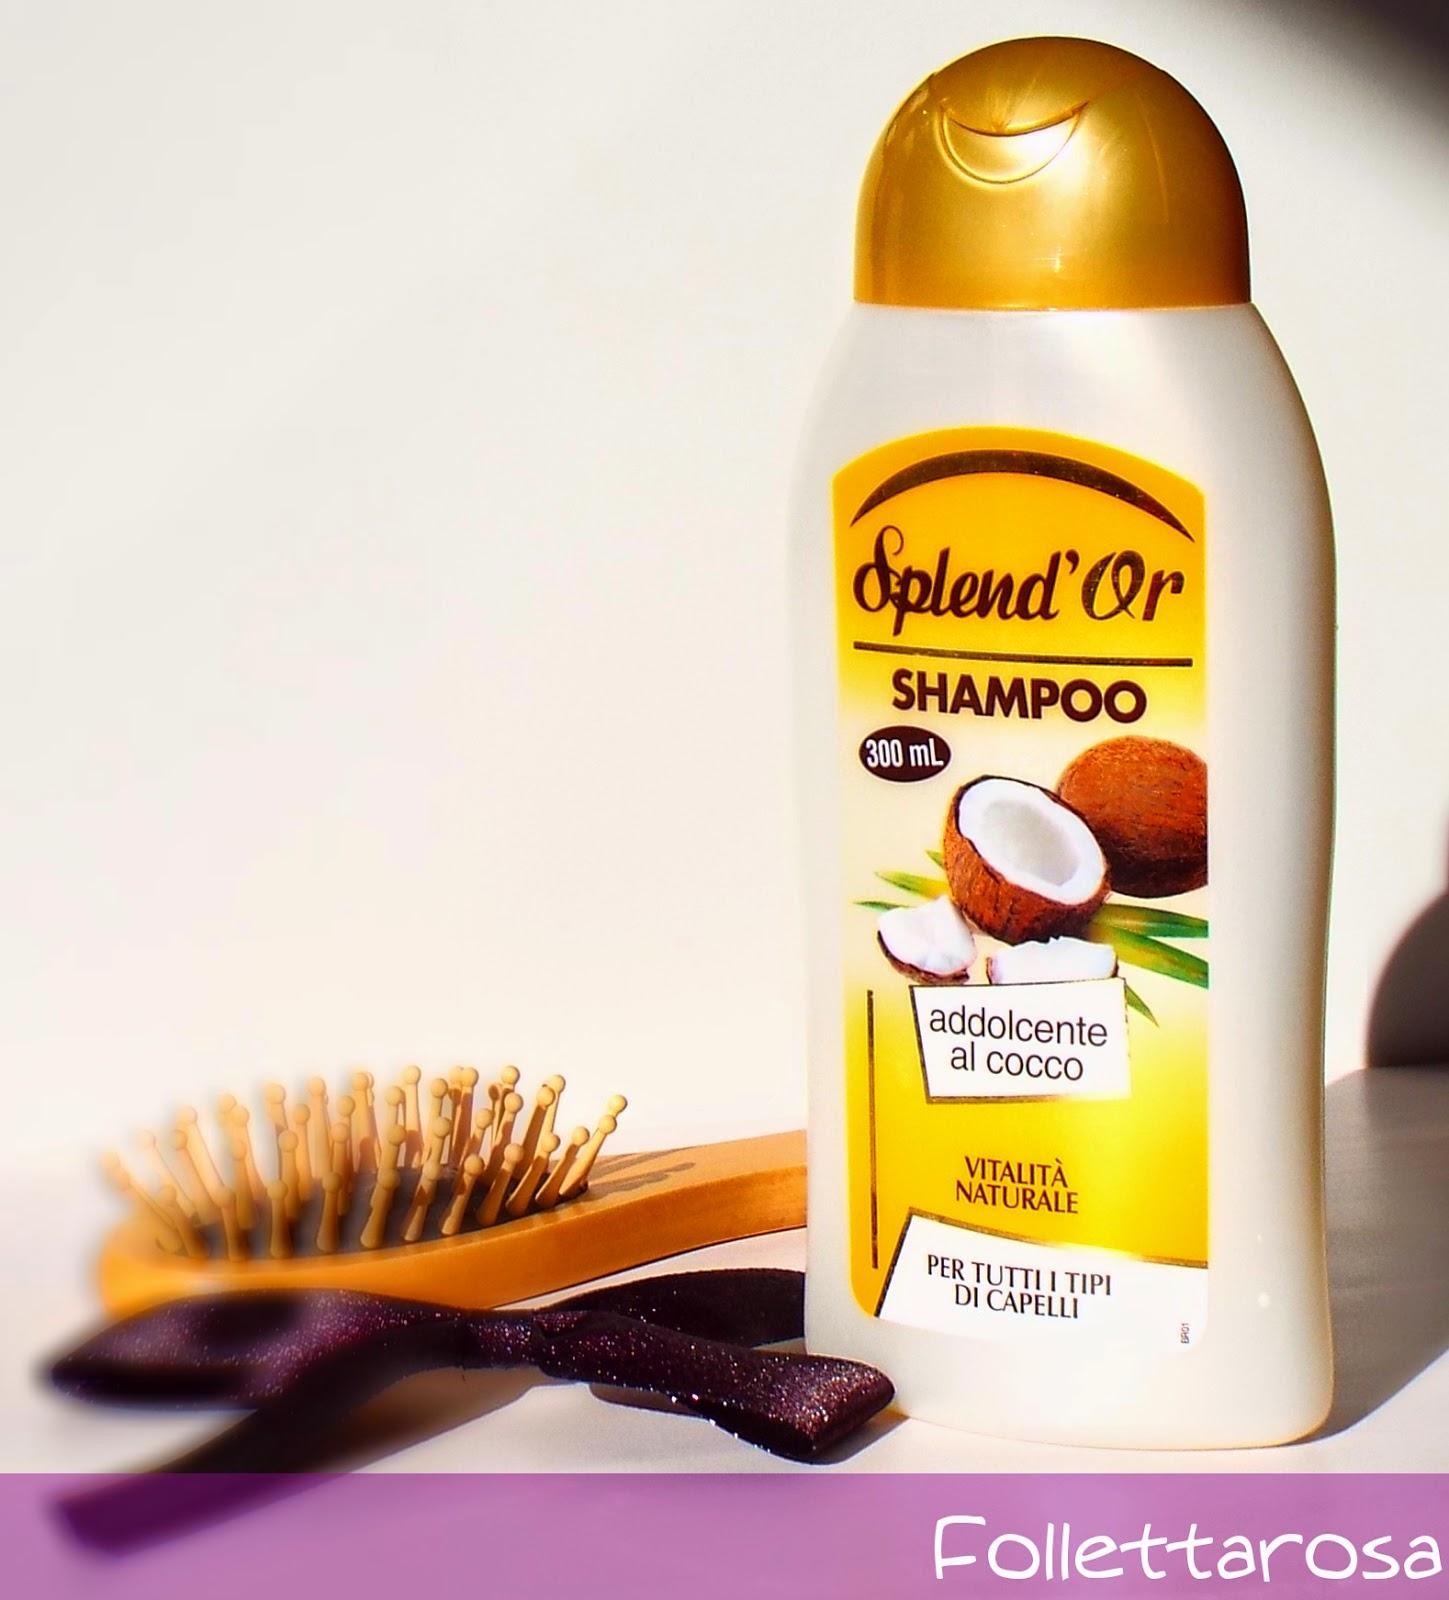 shampoo splendor recensione